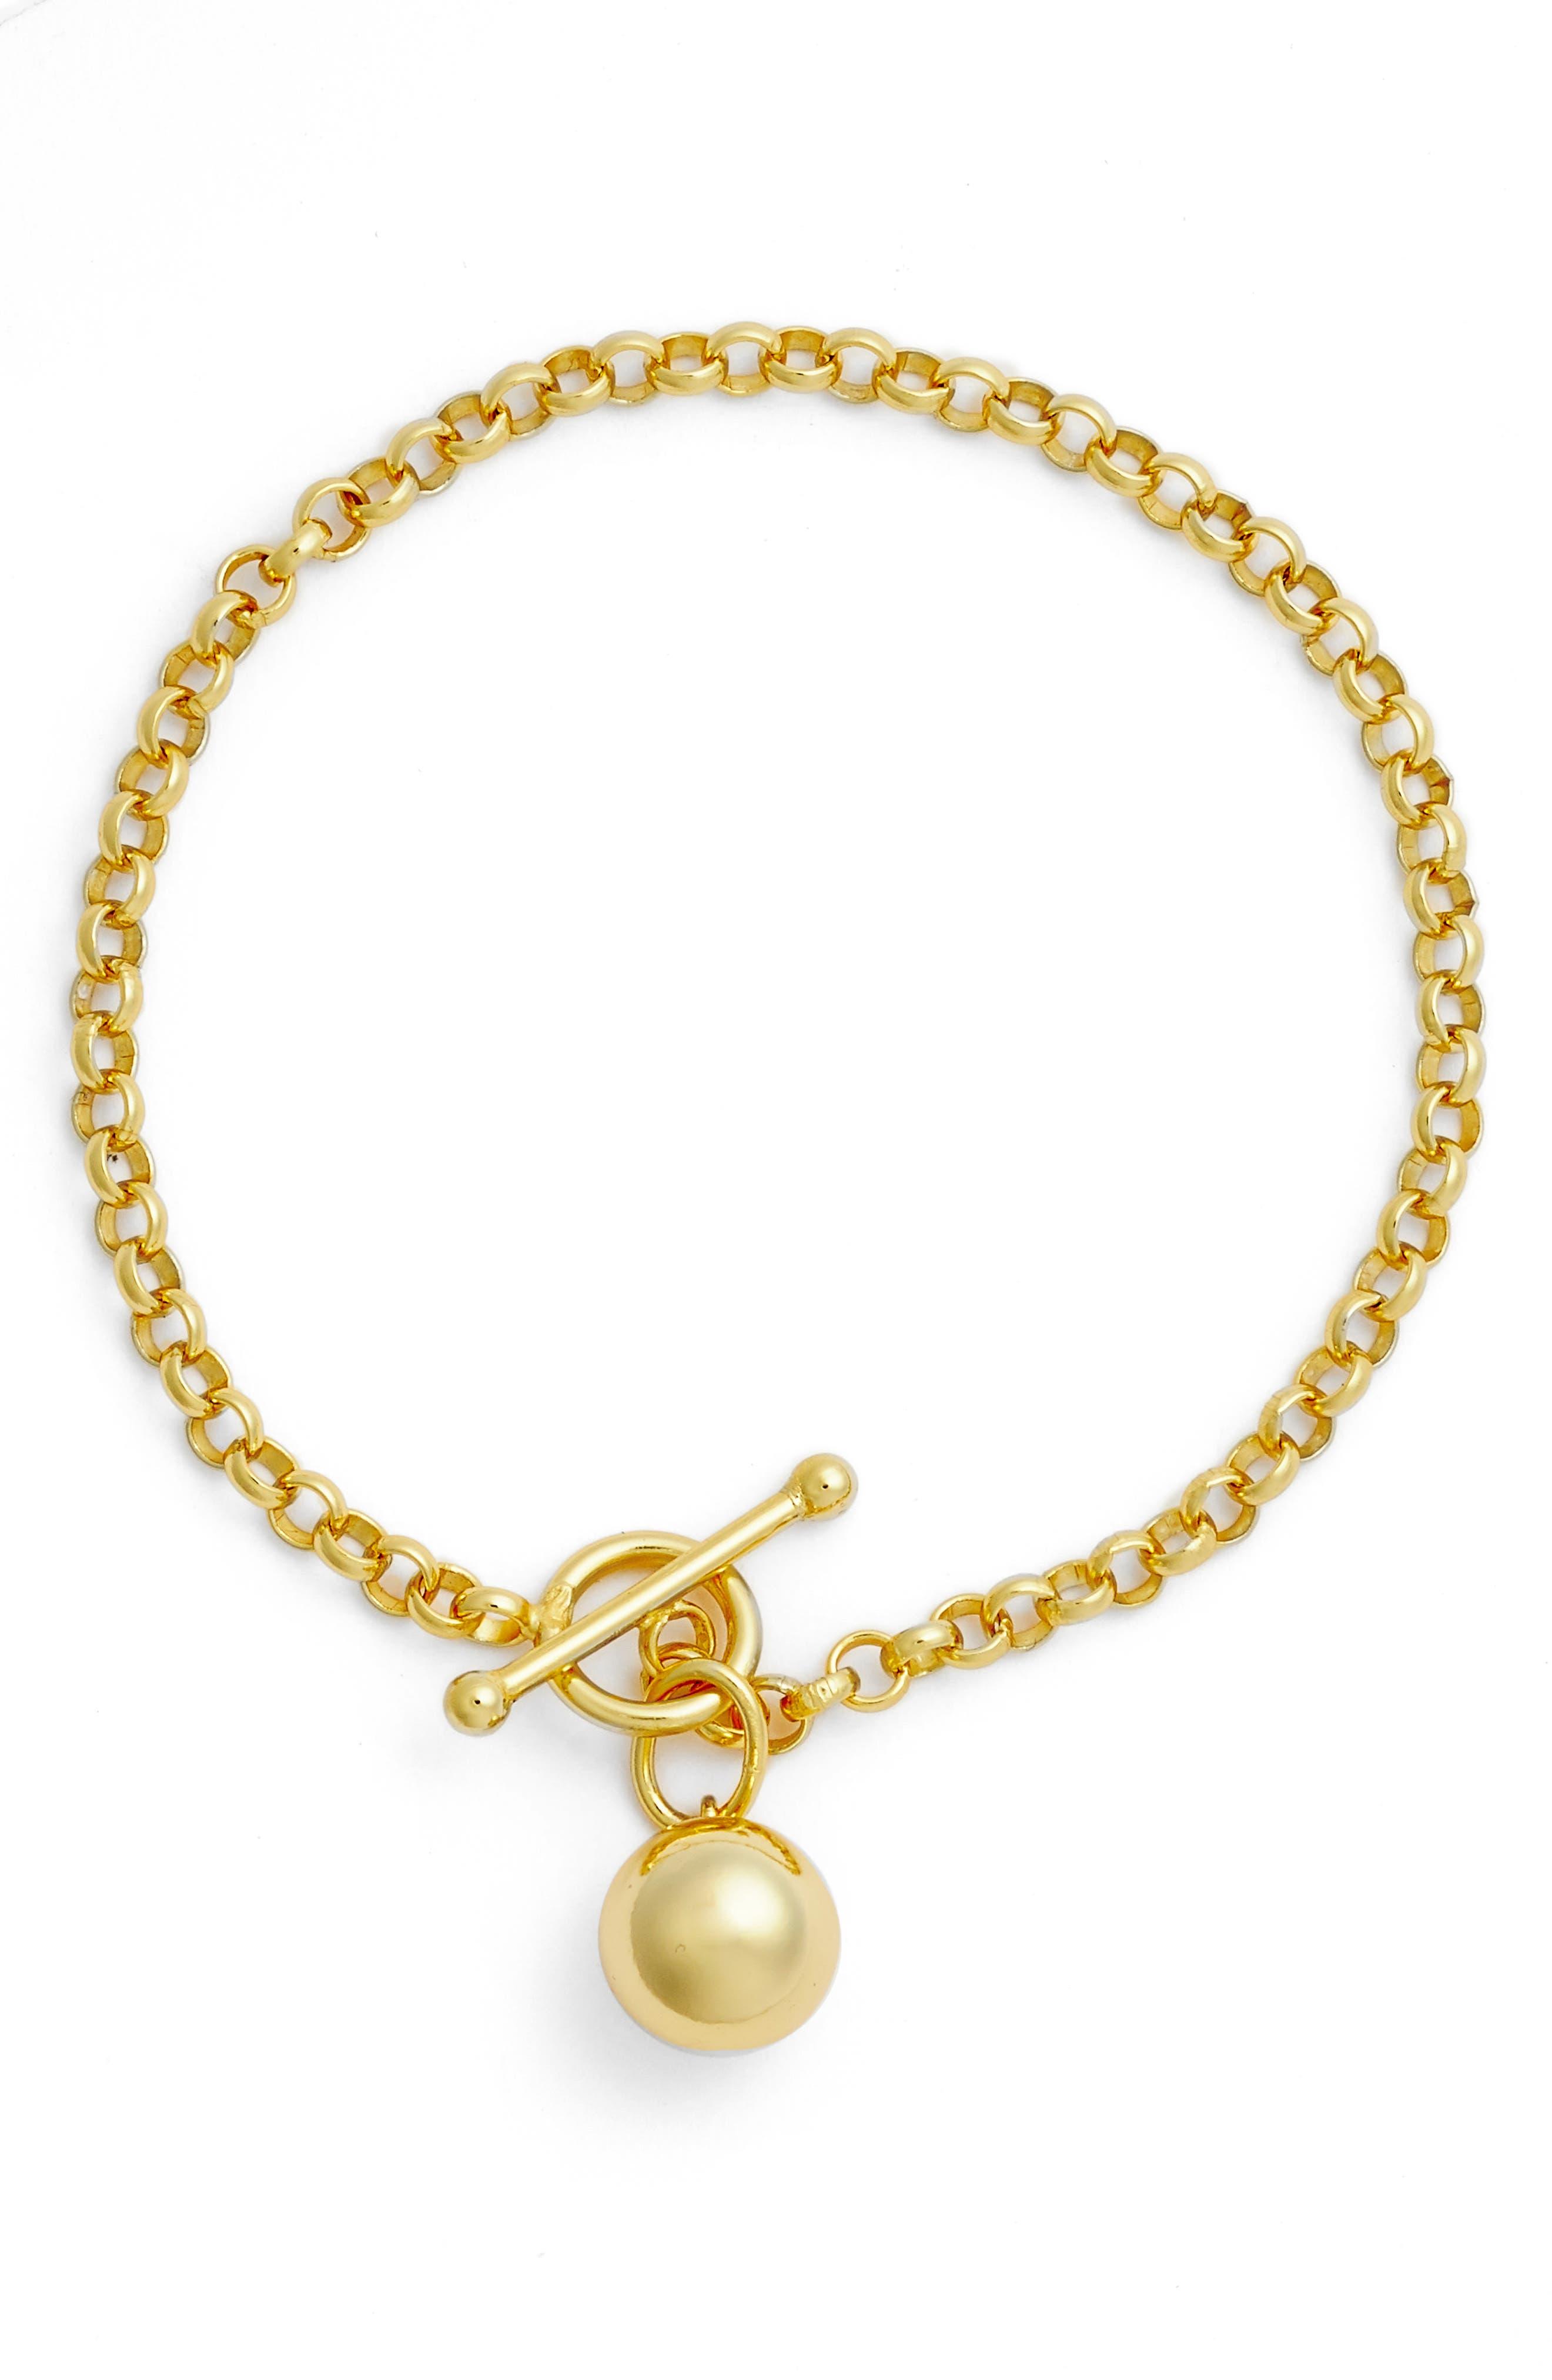 Sphere Charm Link Bracelet,                         Main,                         color, GOLD